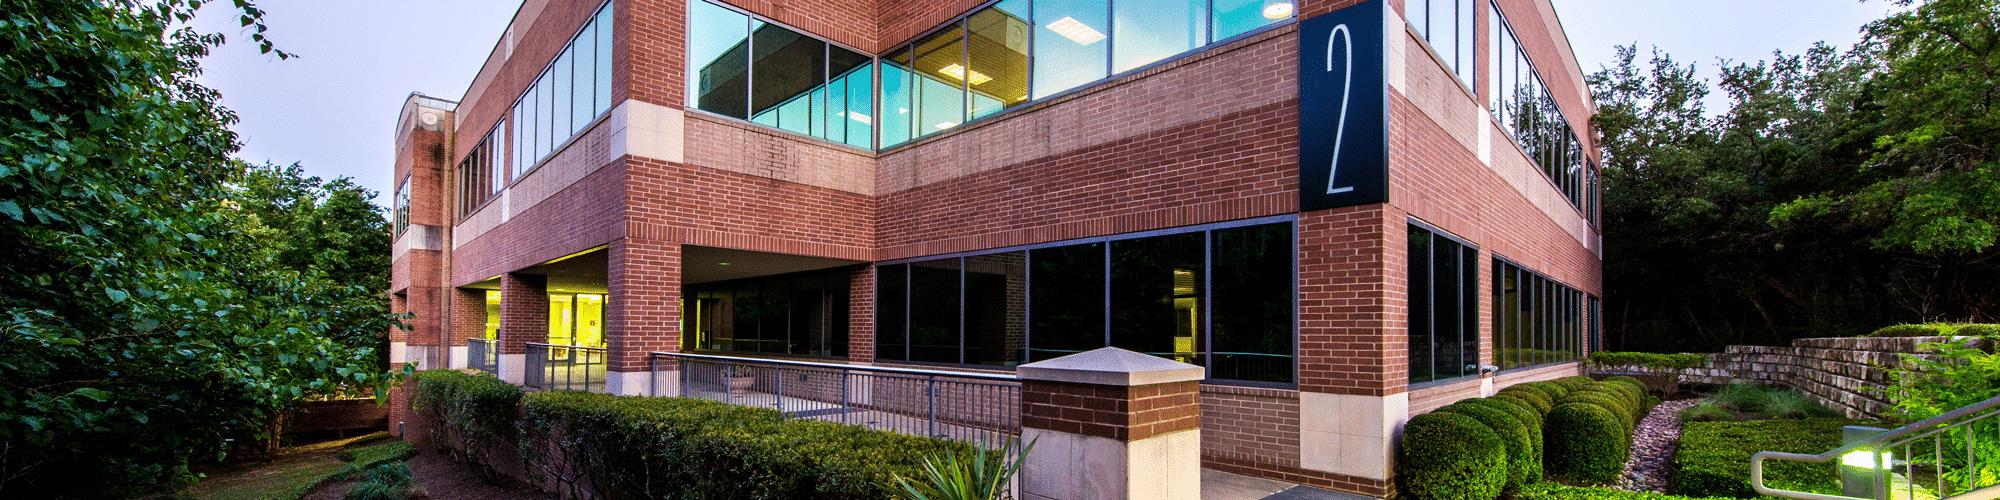 Lakewood-Center-2-Exterior